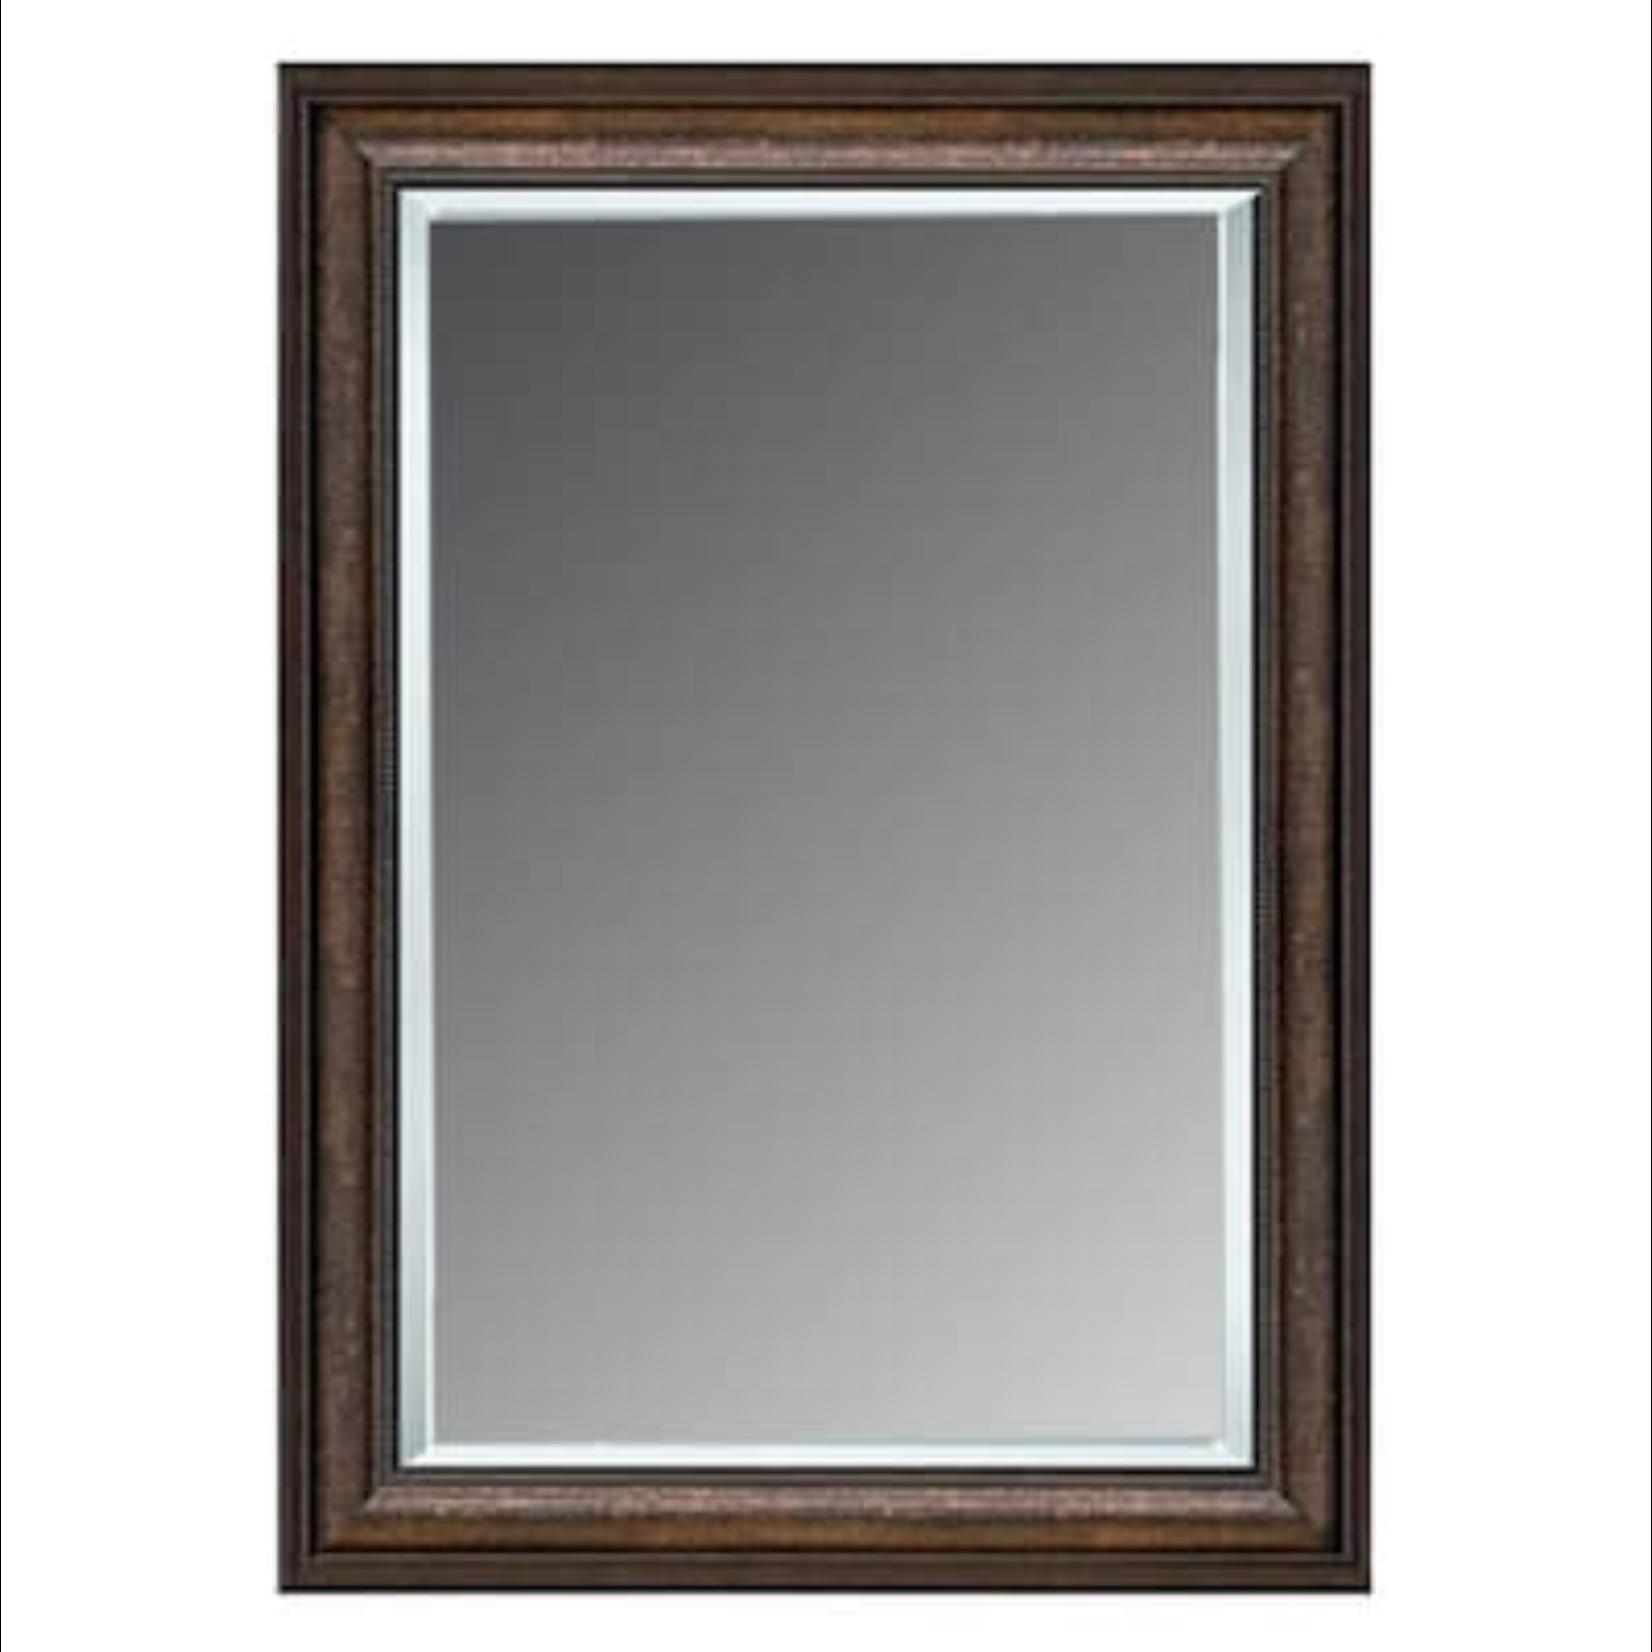 10082 Allen+Roth Copper Beveled Wall Mirror